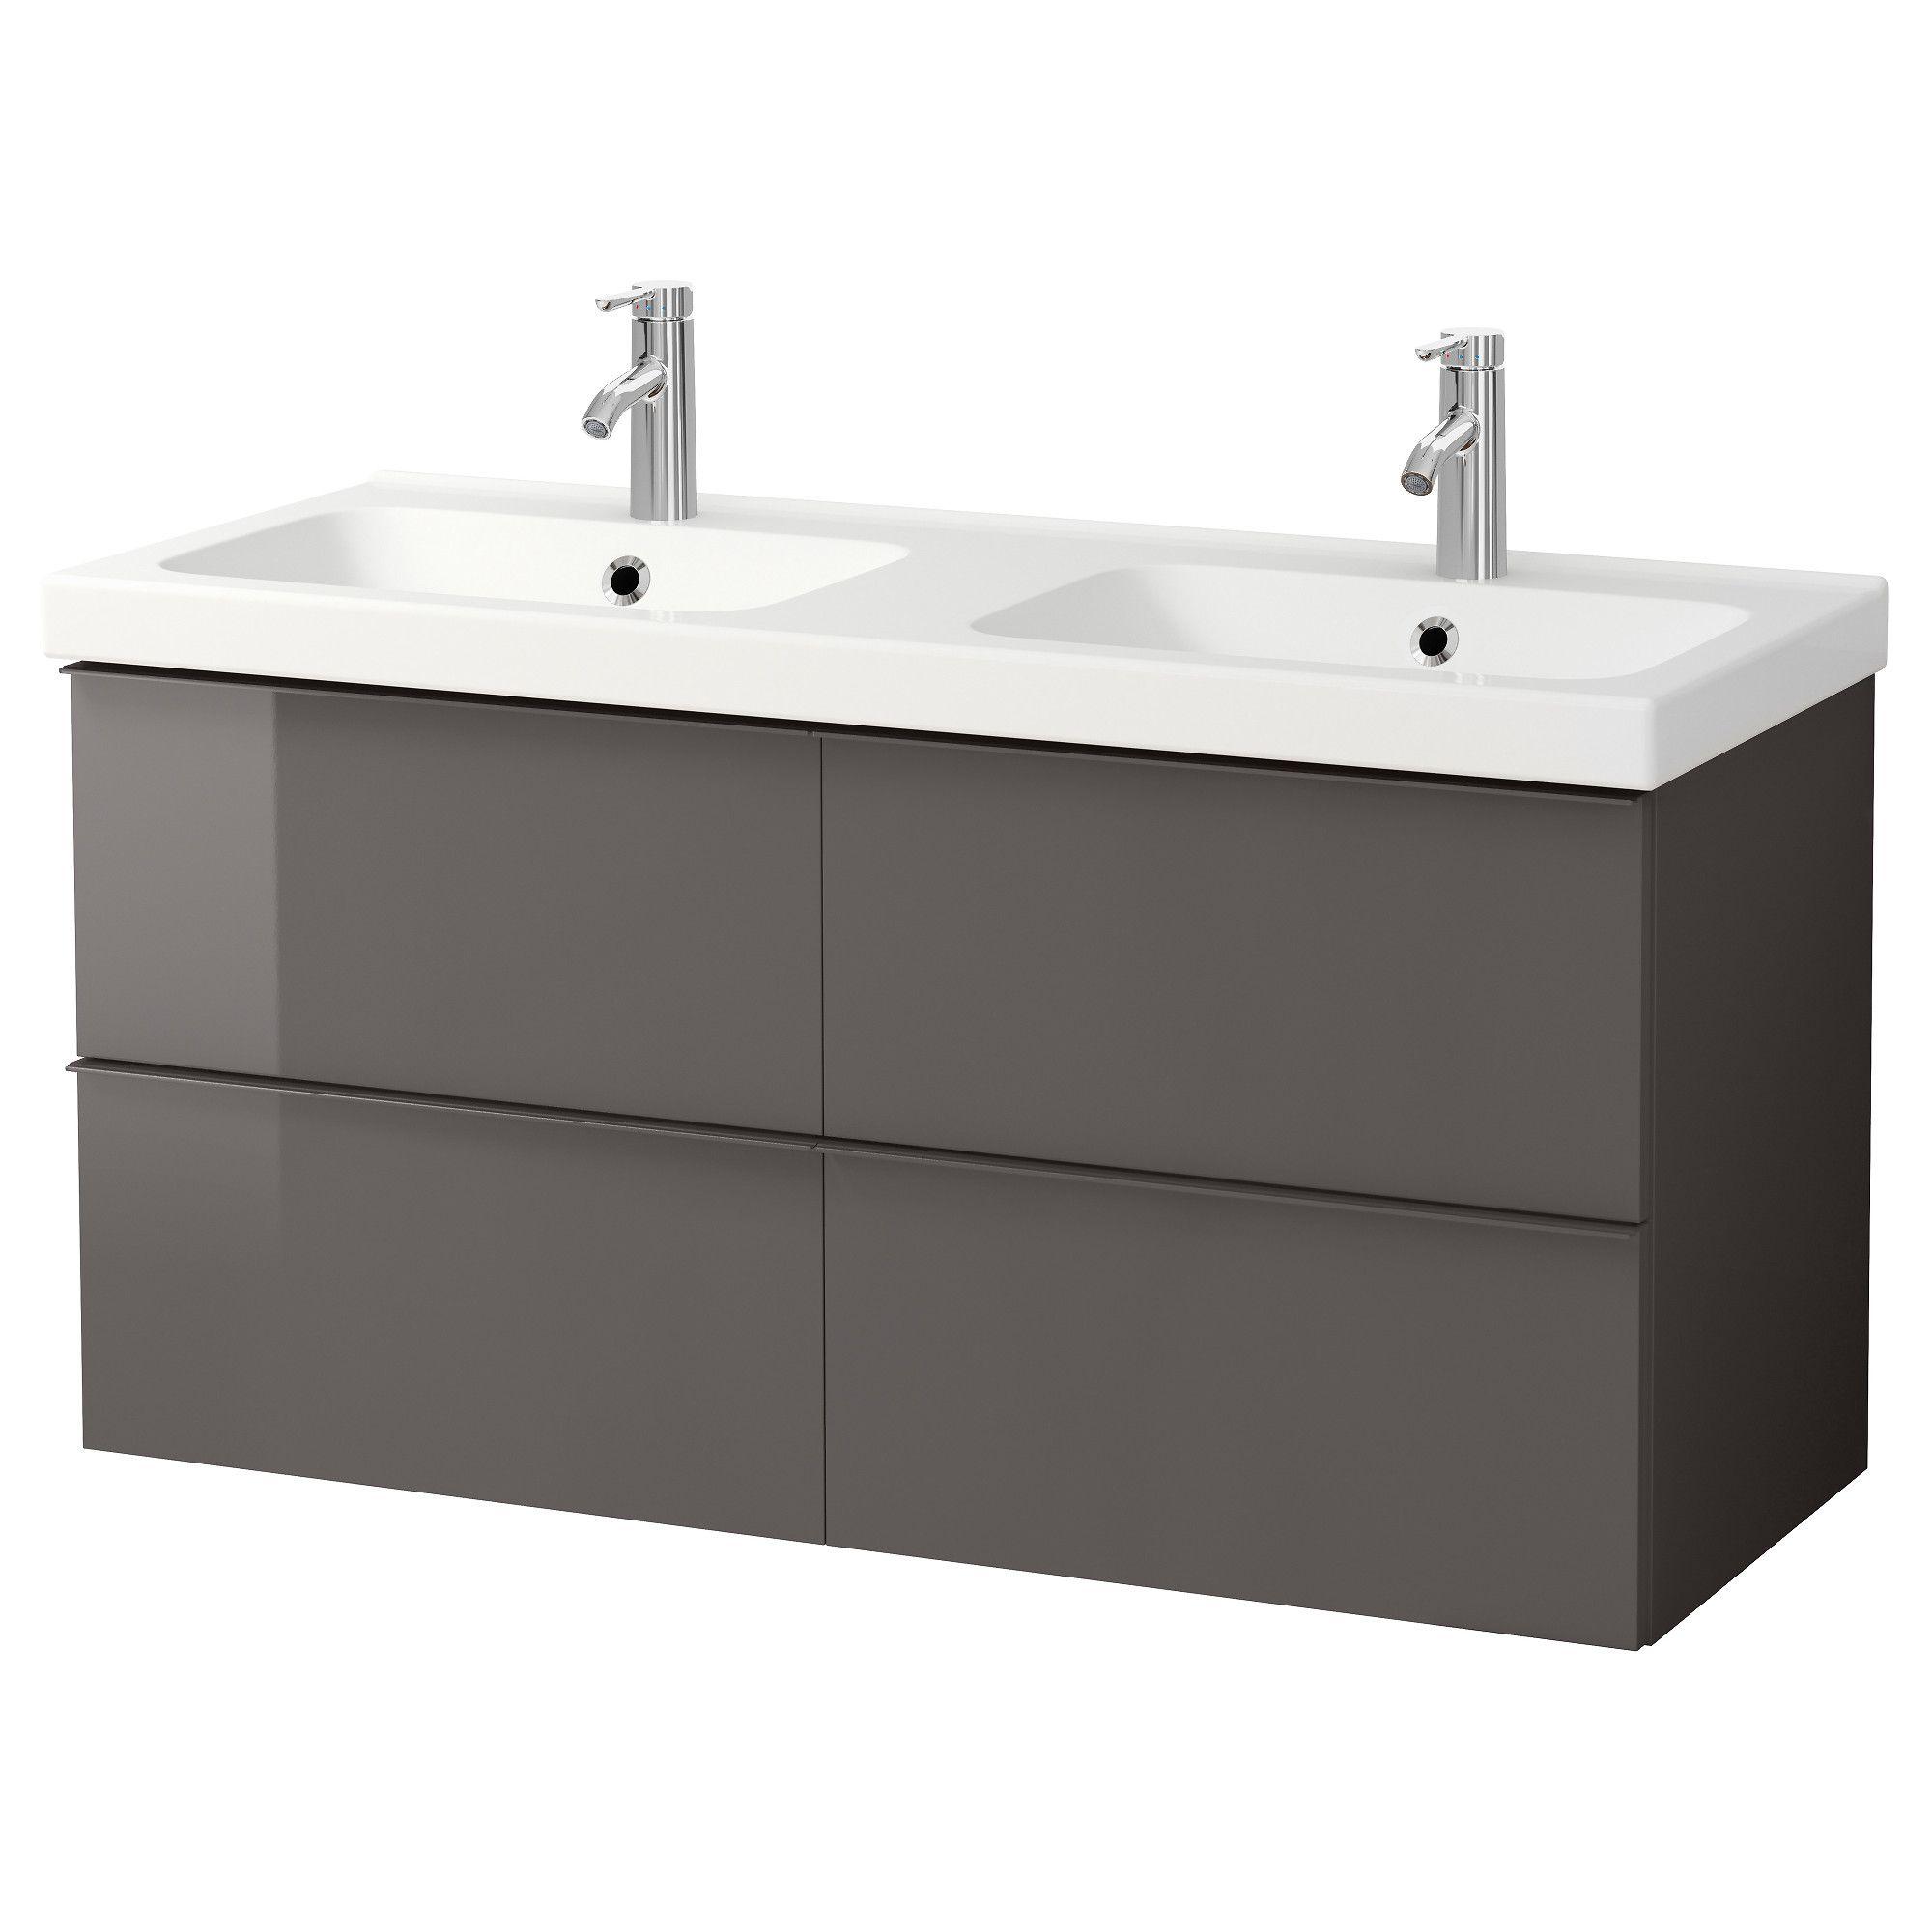 Us Furniture And Home Furnishings Ikea Godmorgon Bathroom Sink Cabinets Ikea Bathroom